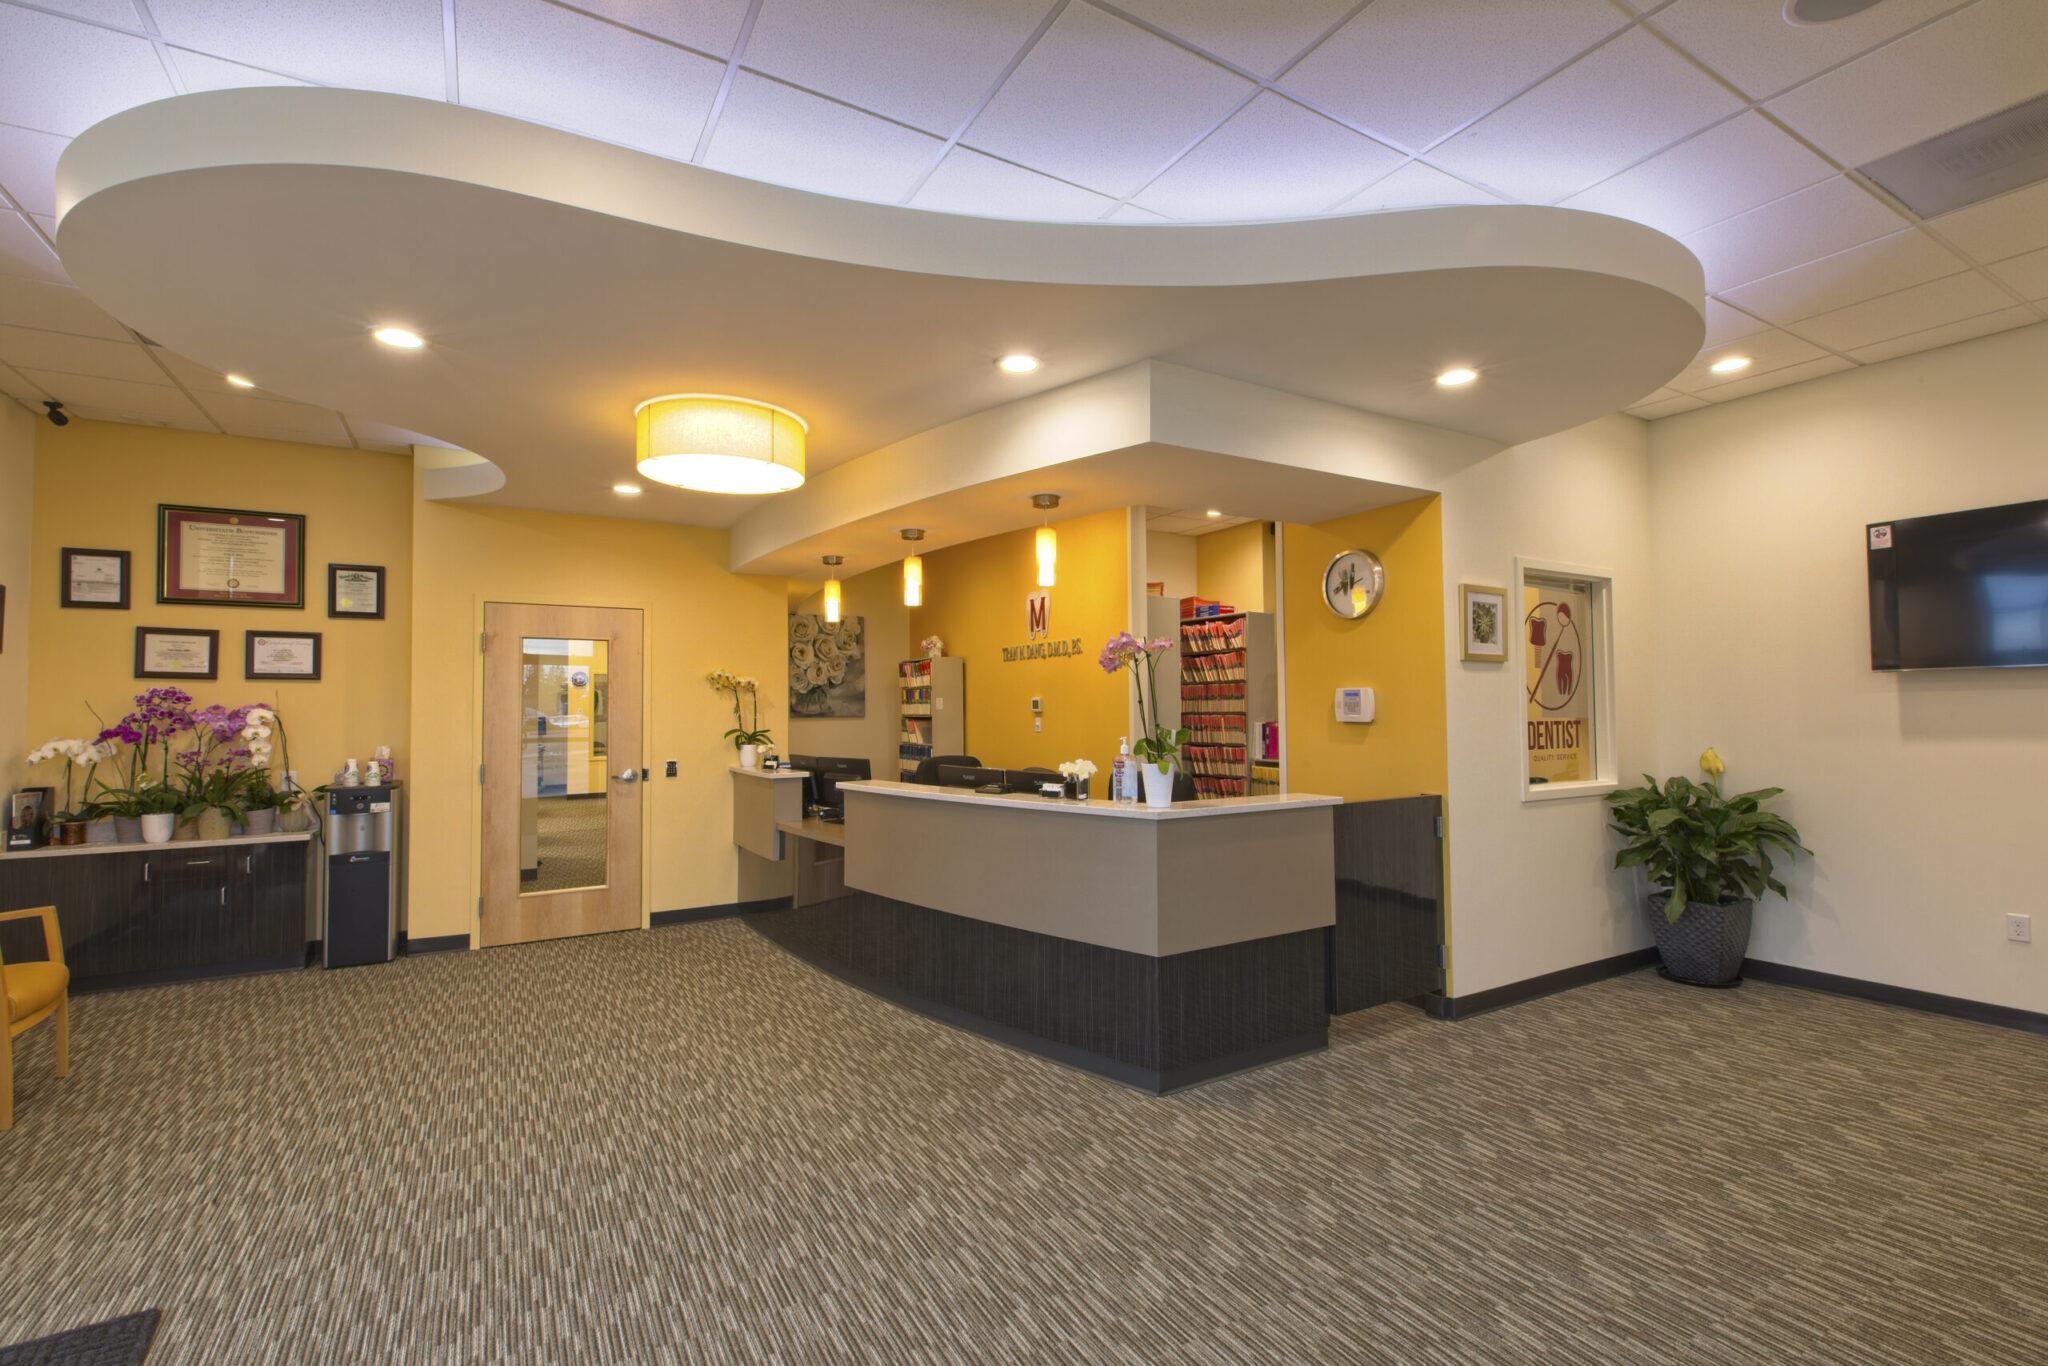 1701.2 - Interior - M Street Dental, Tacoma